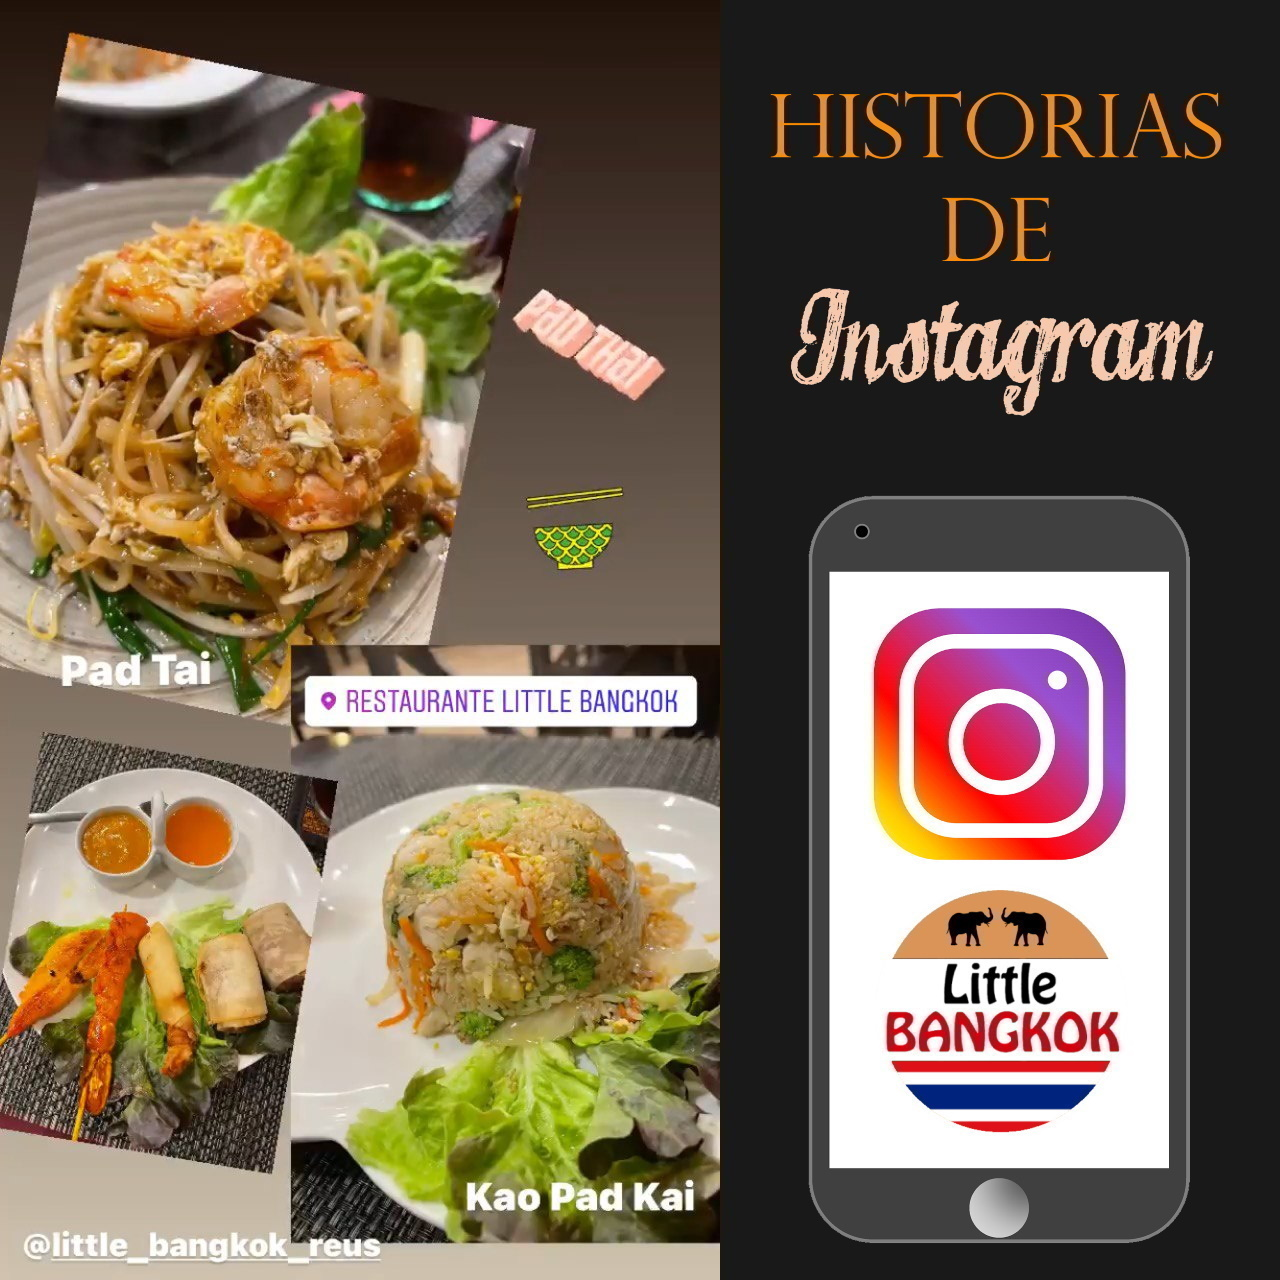 Historias de Instagram - 09 - Setembre 3